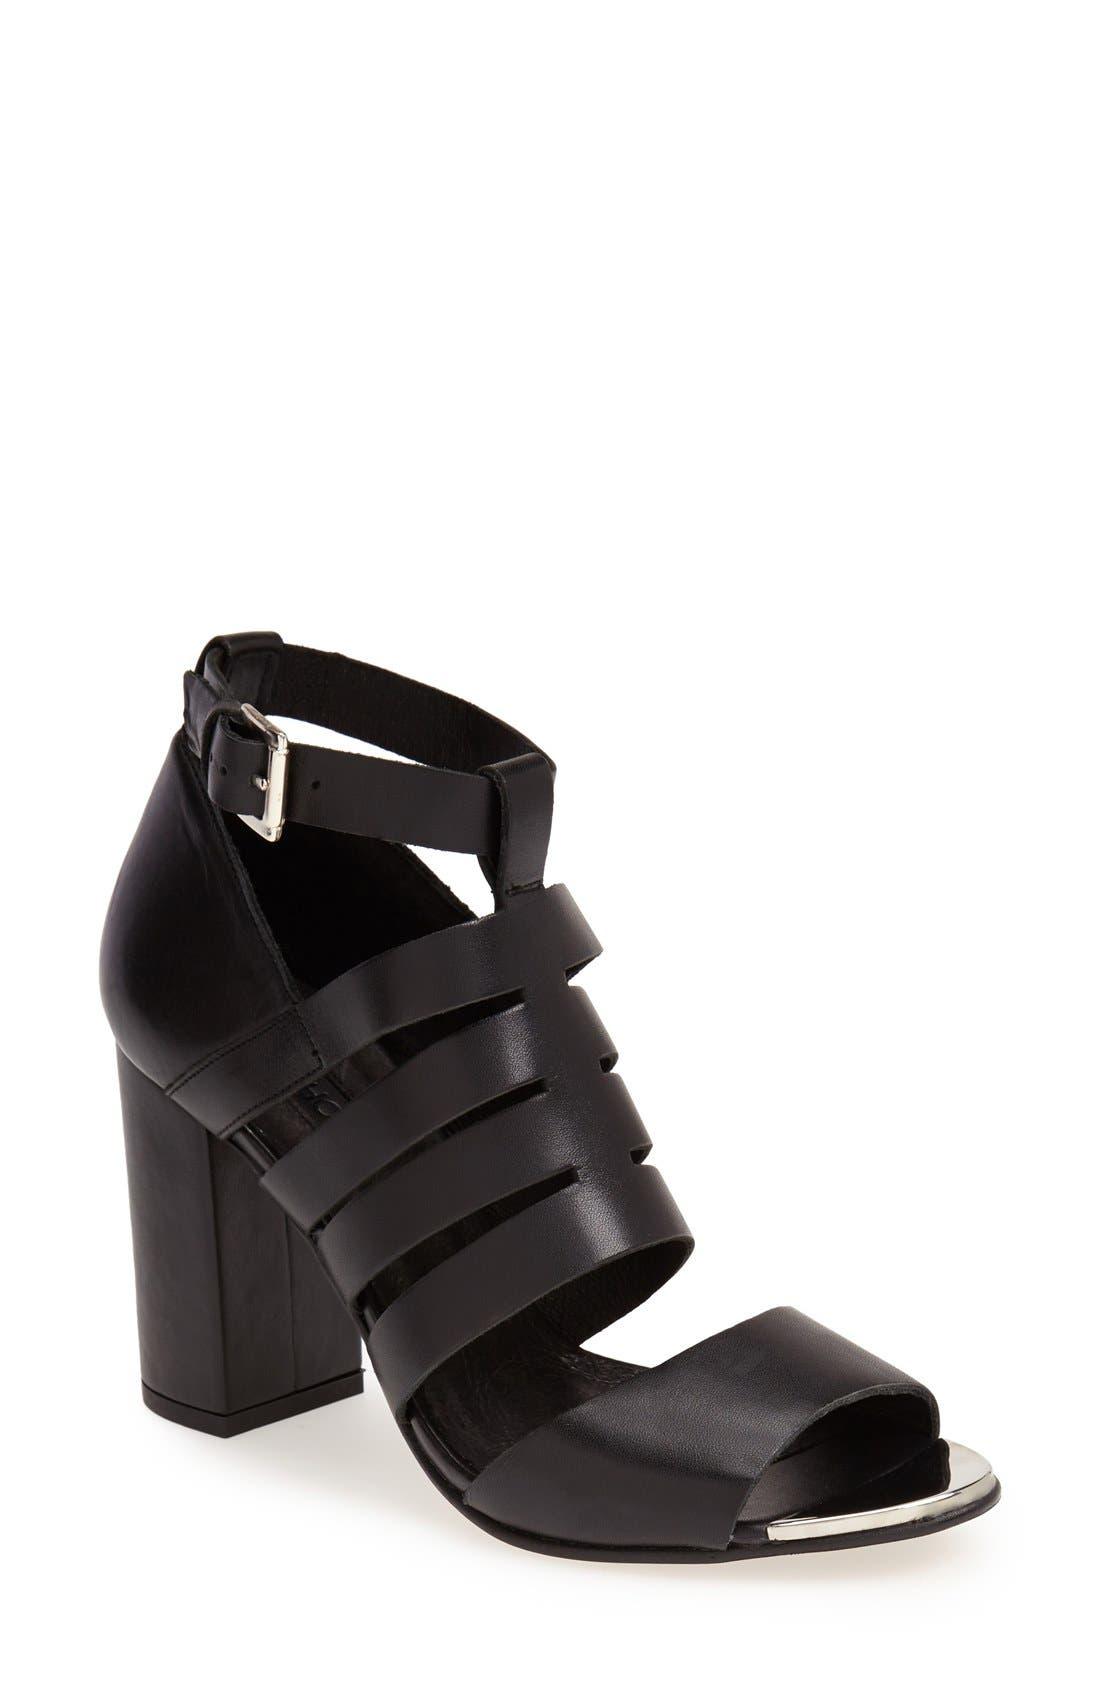 Main Image - Topshop 'Glare' Cutout Gladiator Sandal (Women)